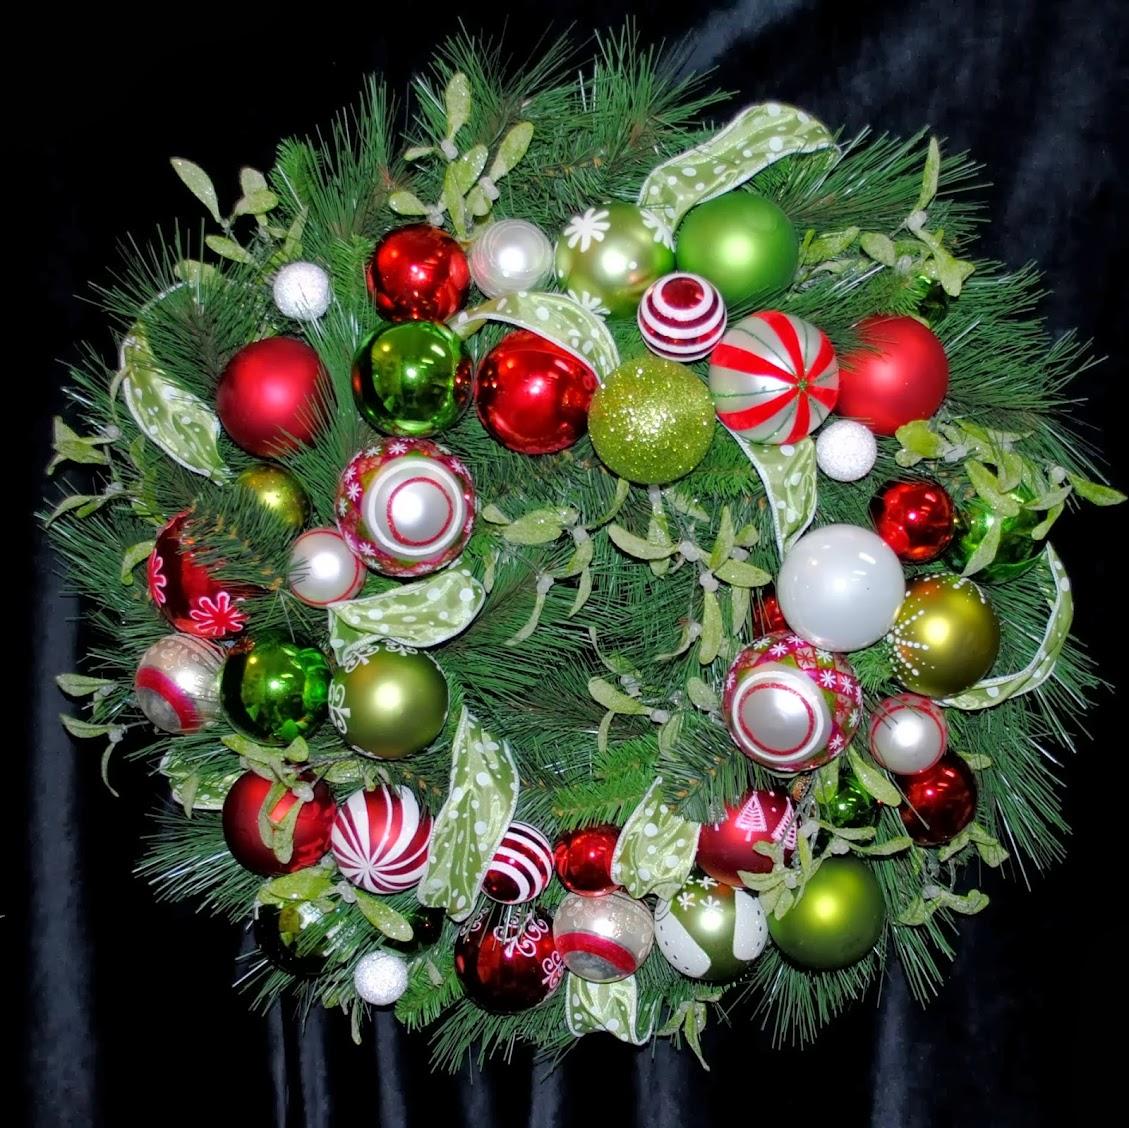 Jingle, Jingle, Jingle Christmas Ornament Wreath OWR8038